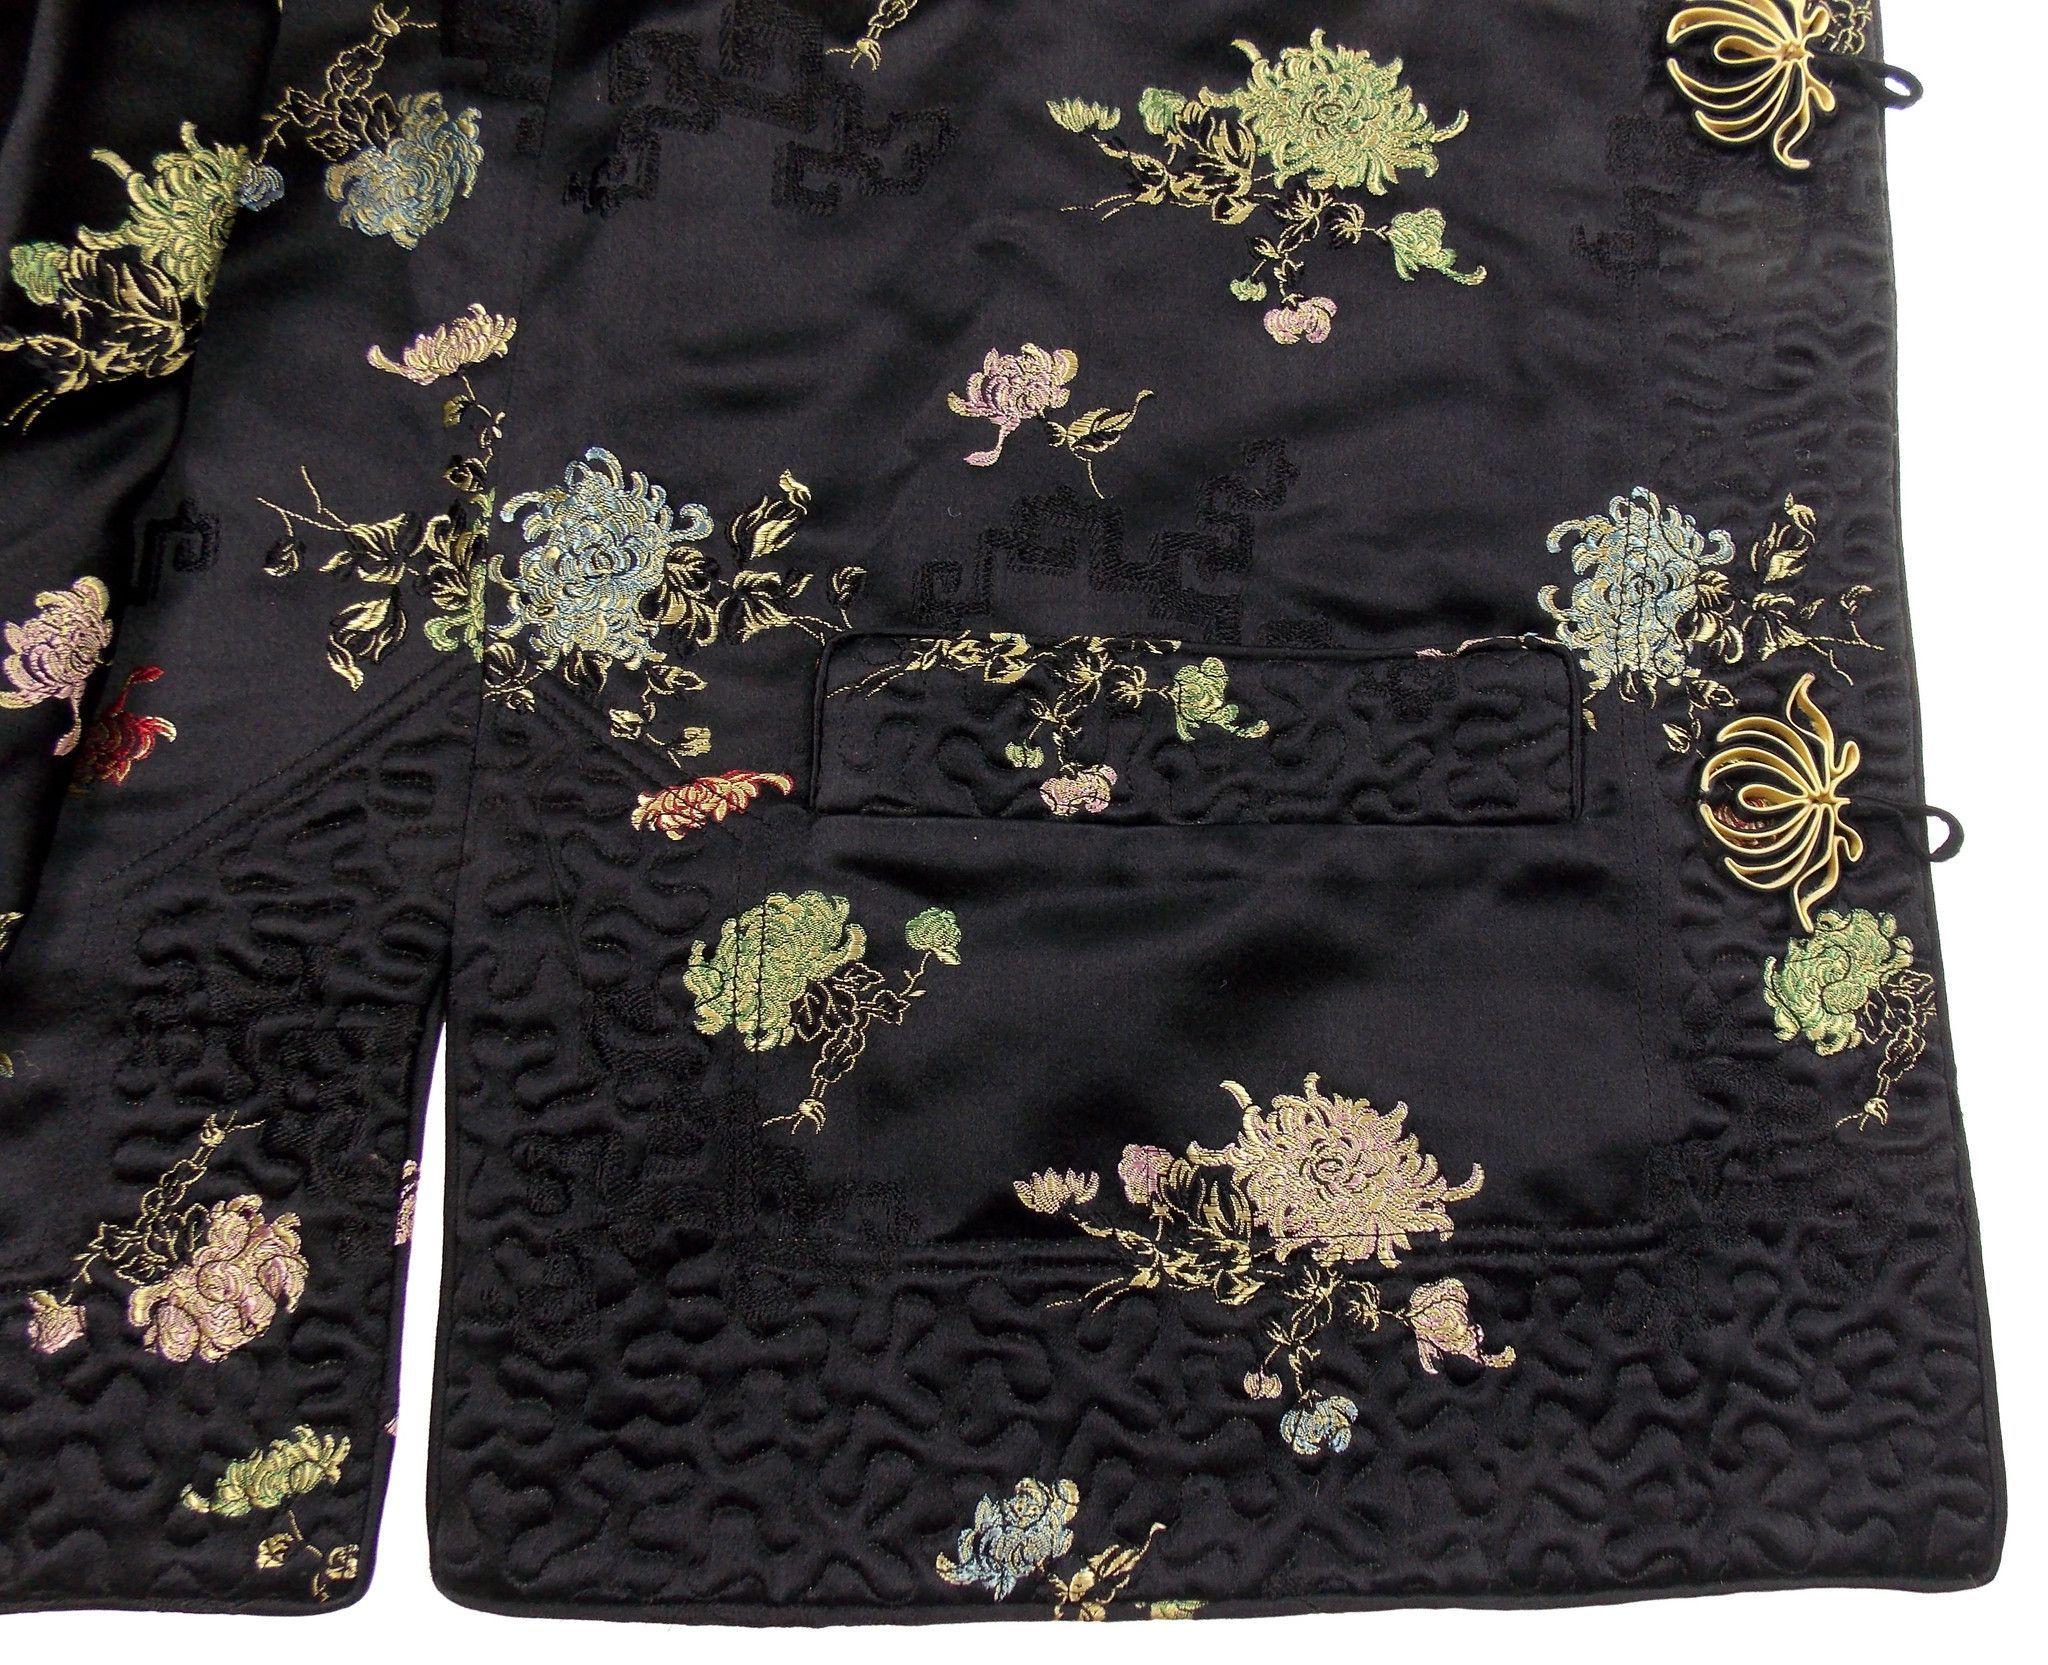 Ella chen black oriental asian bed jacket frog closure lined slits